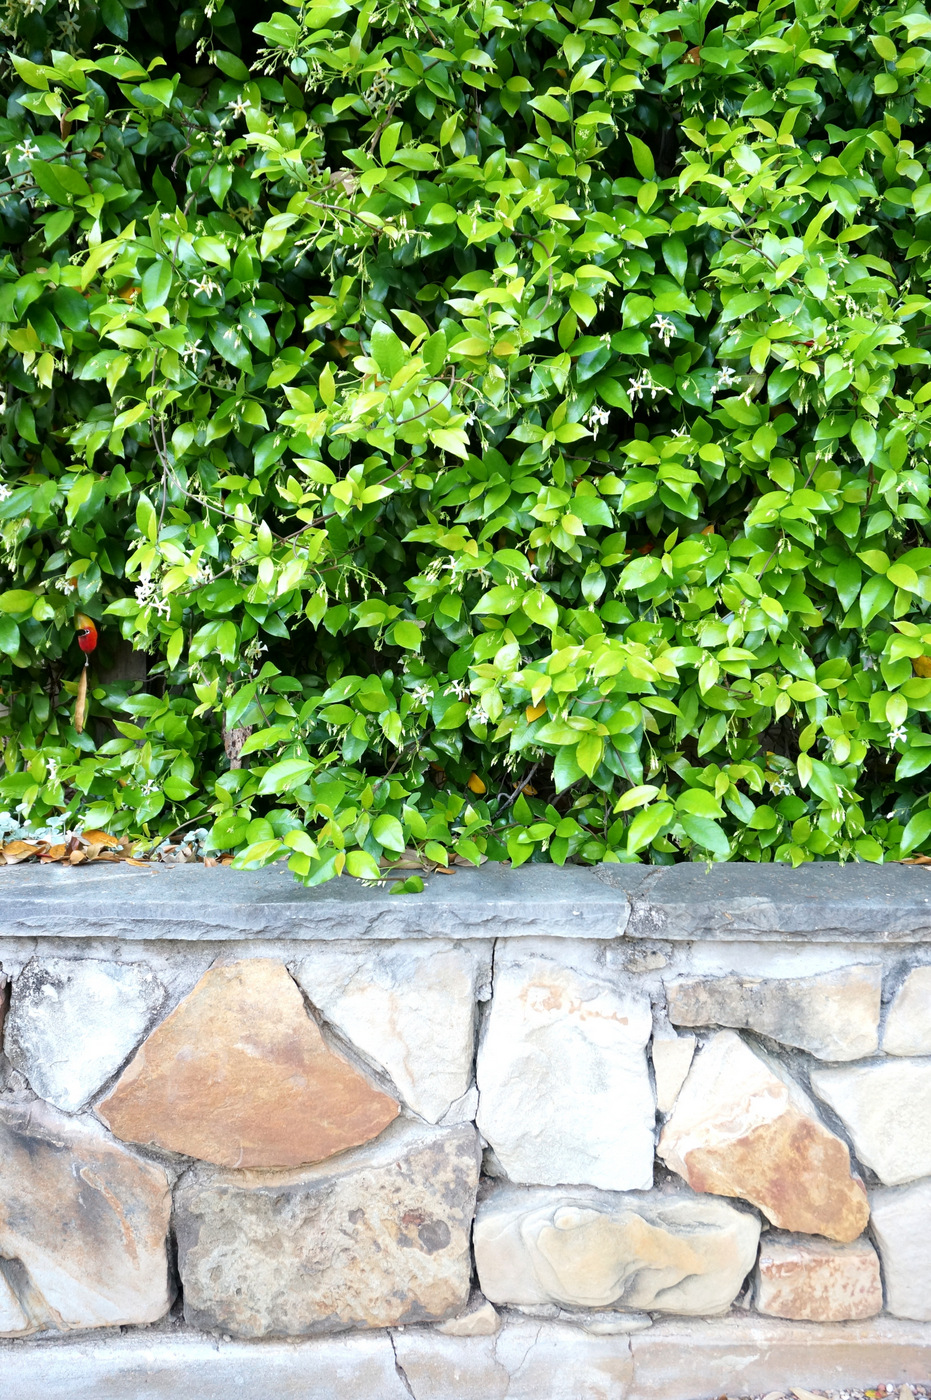 Rock wall and jasmine vine